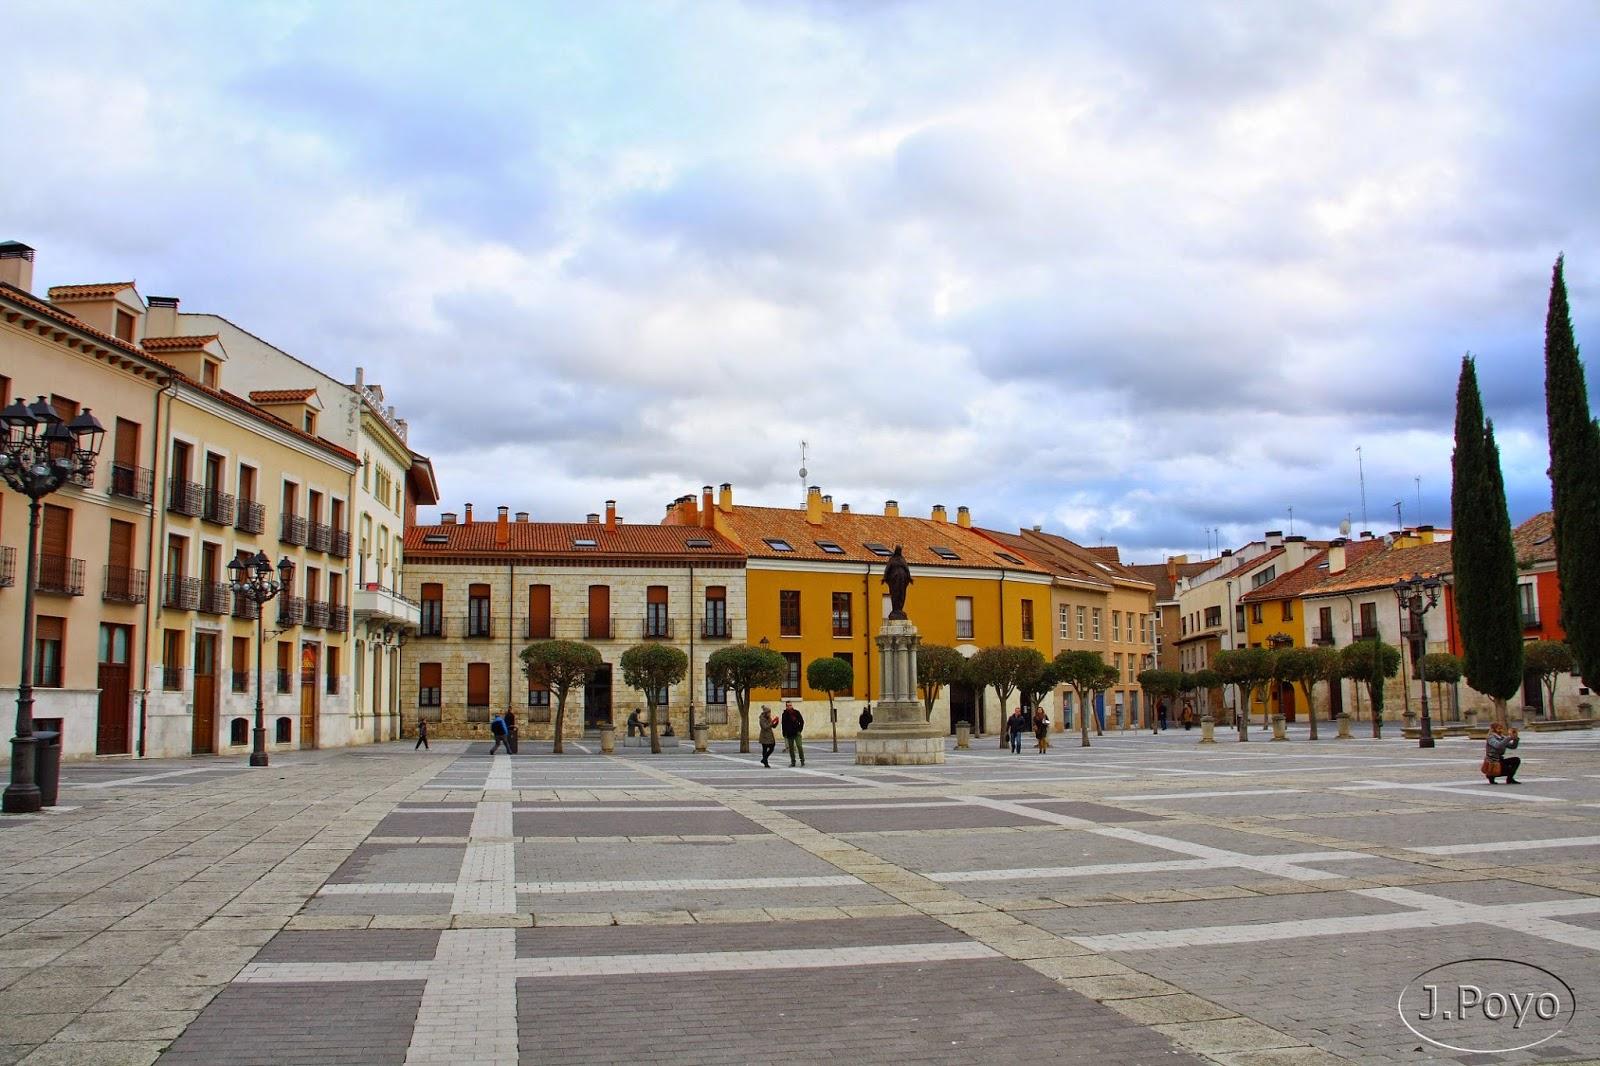 Plaza de la catedral de Palencia